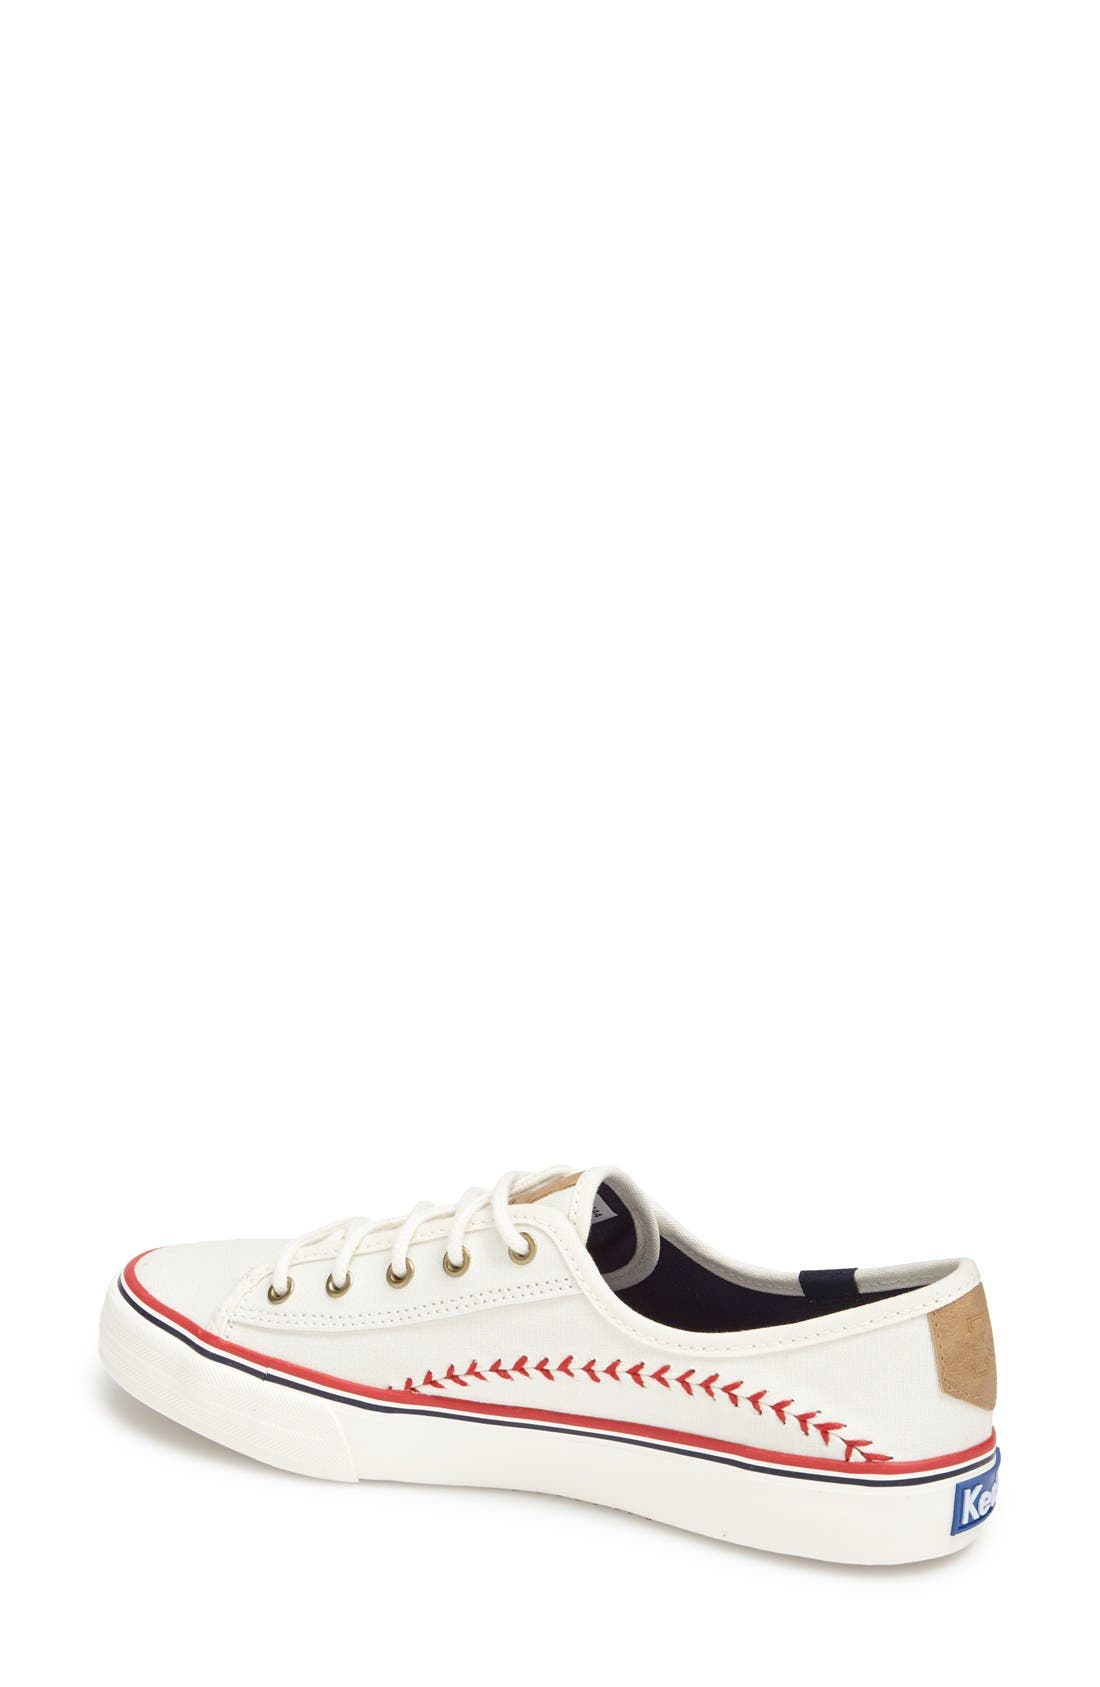 Alternate Image 2  - Keds® 'Champion - Double Take' Sneaker (Women)